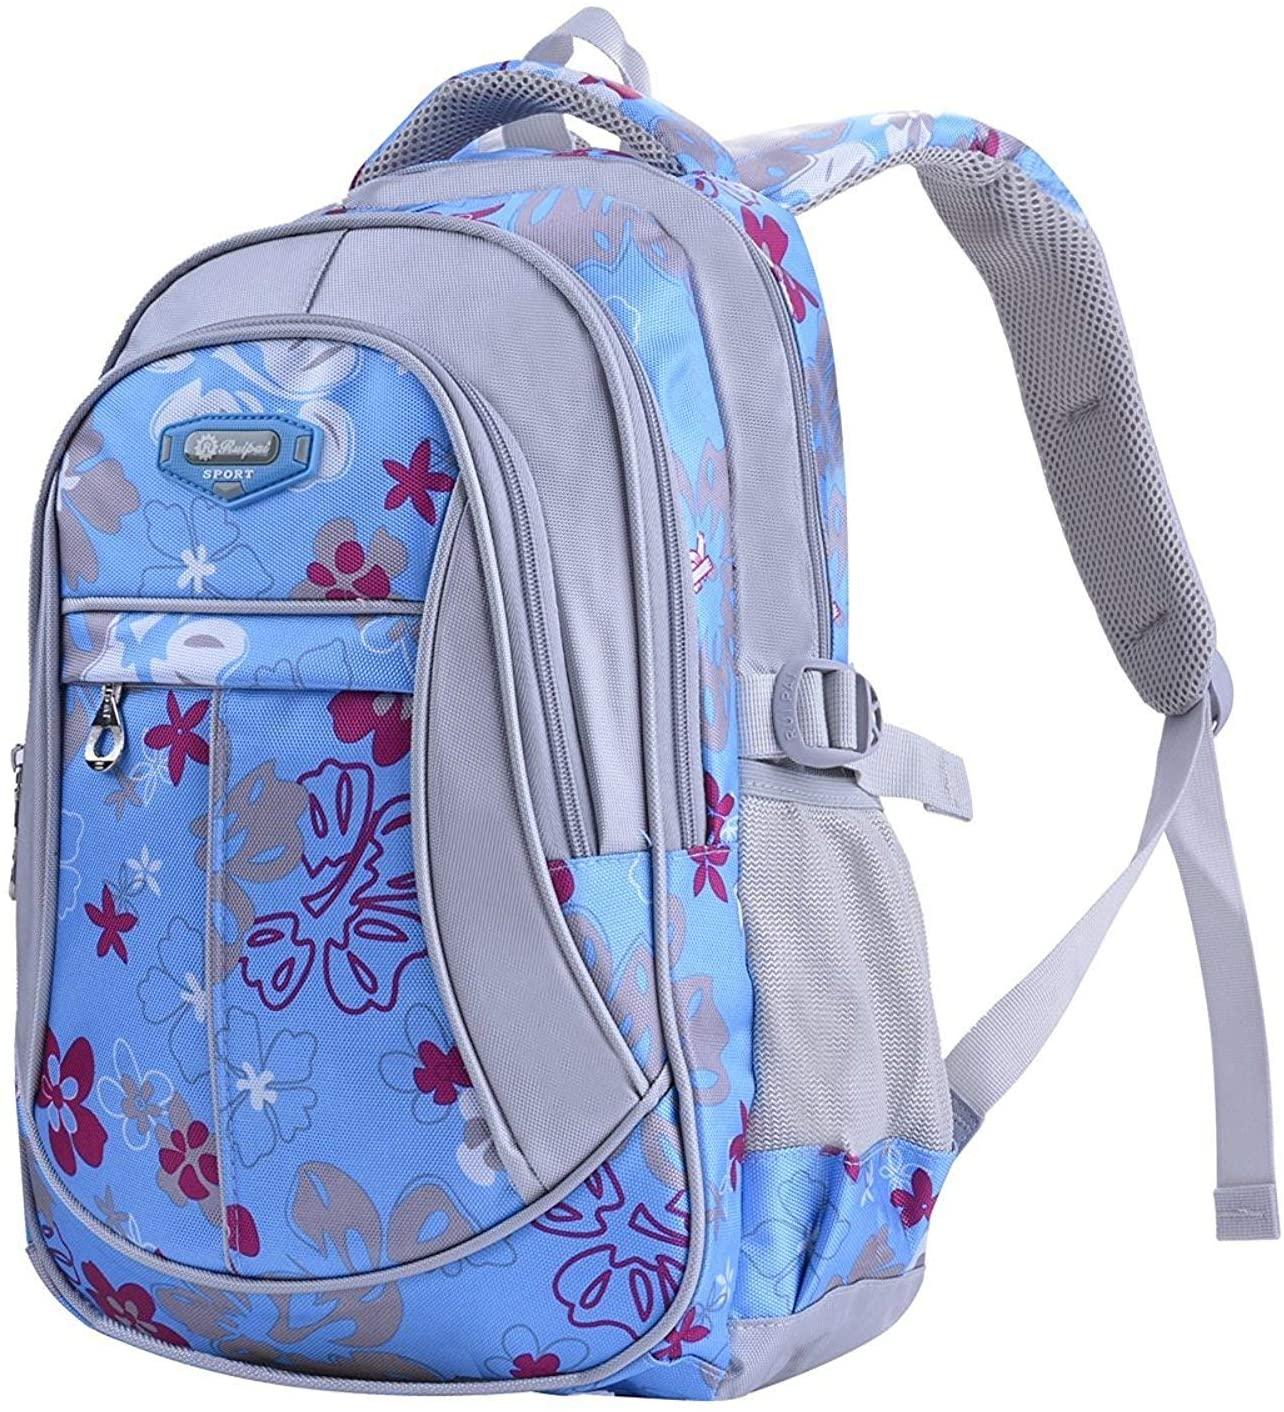 MAYZERO School Backpacks Waterproof School Bags Durable Travel Camping Backpacks for Boys and Girls (3 Blue)